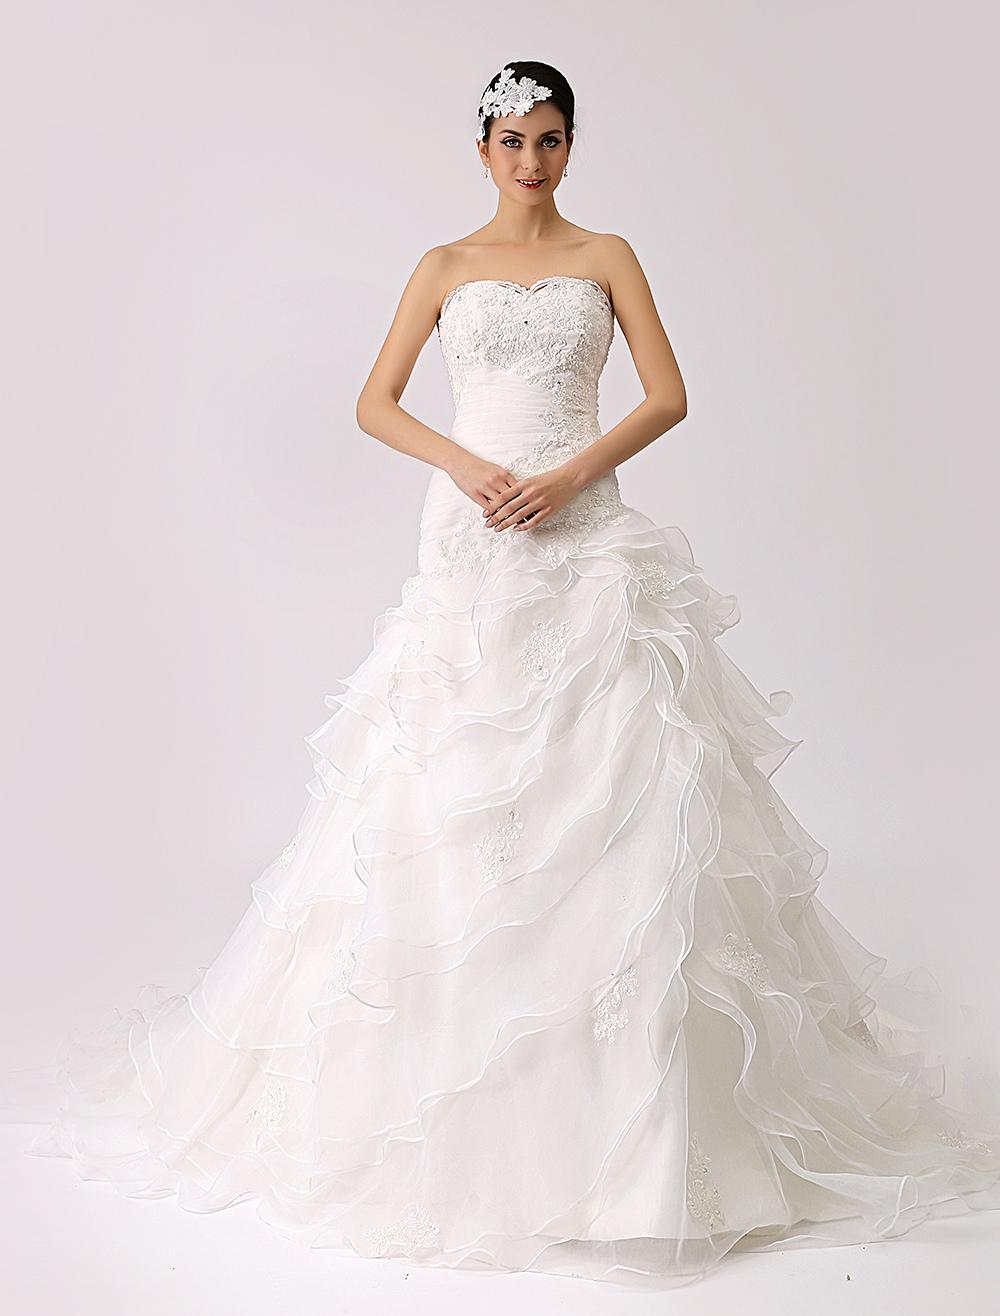 Strapless Trumpet Wedding Dress with Tiered Ruffles Milanoo